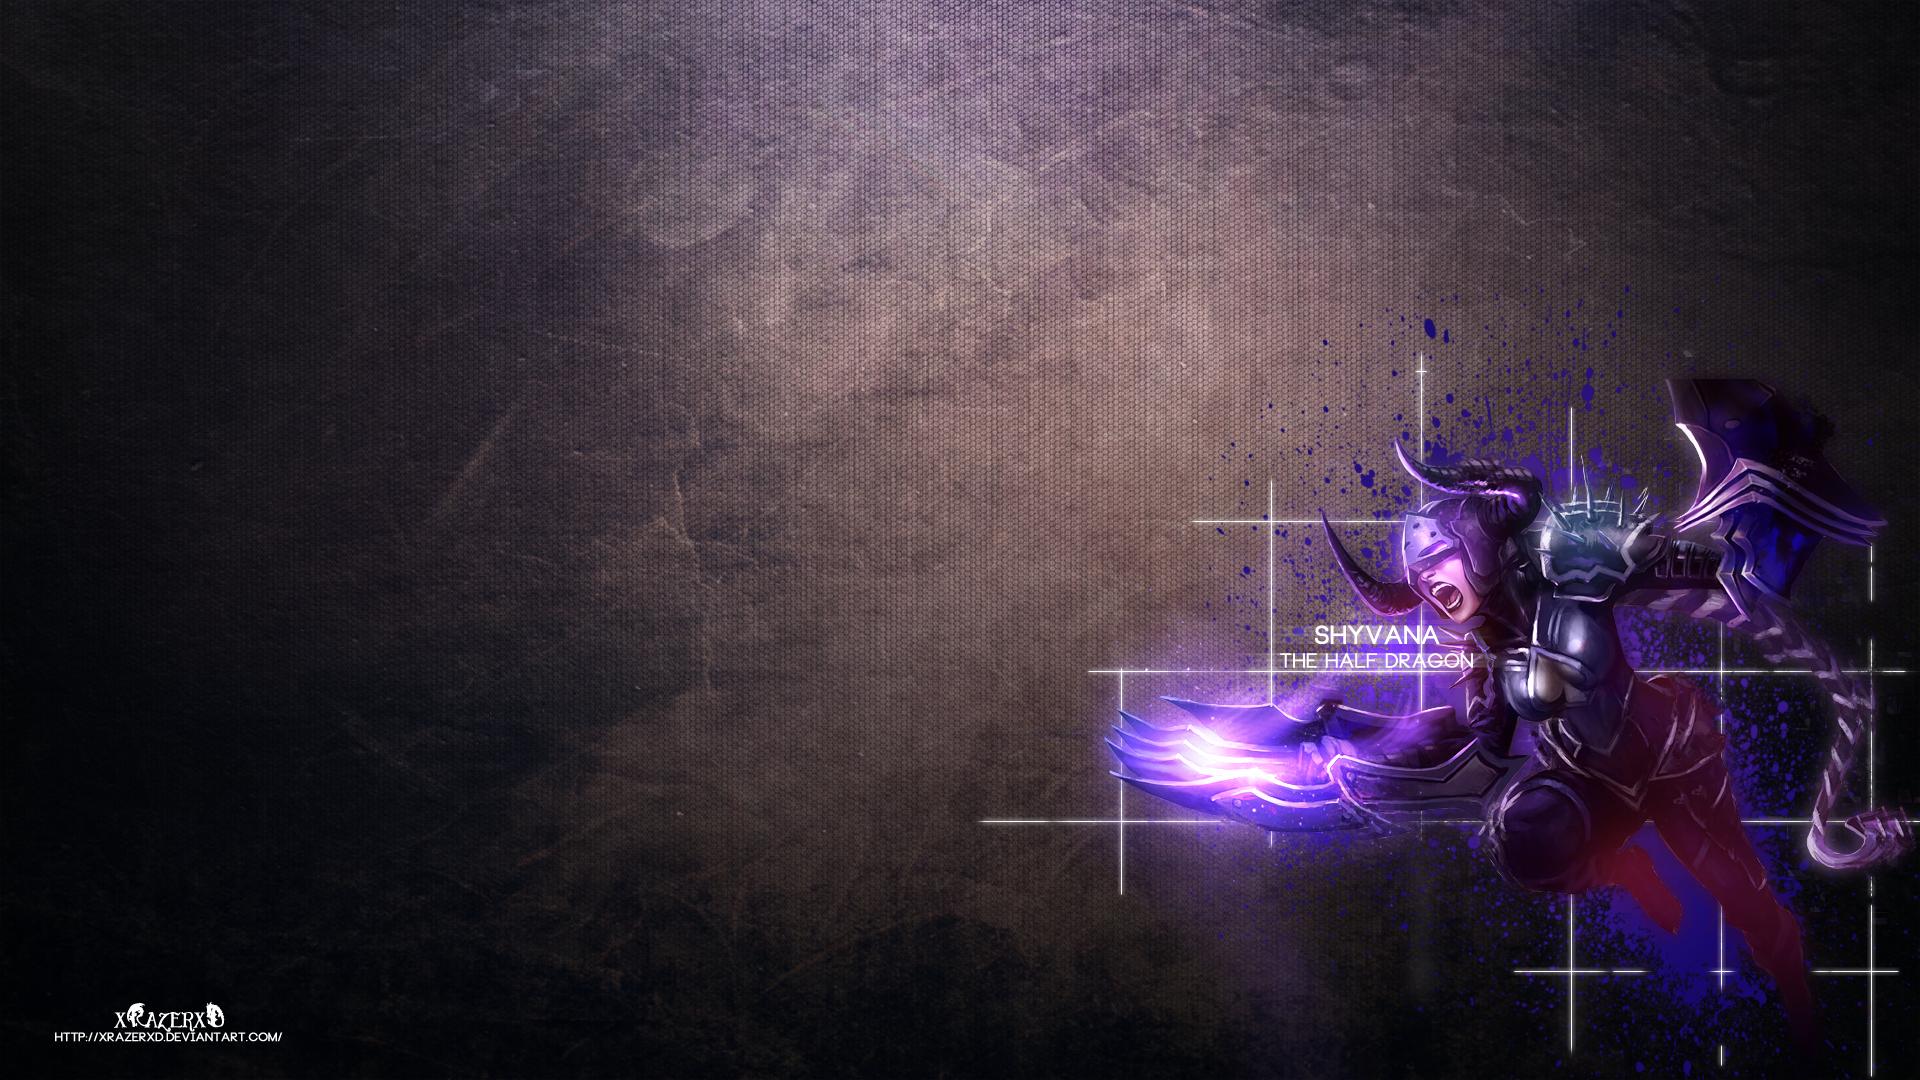 DarkFlame Shyvana wallpaper